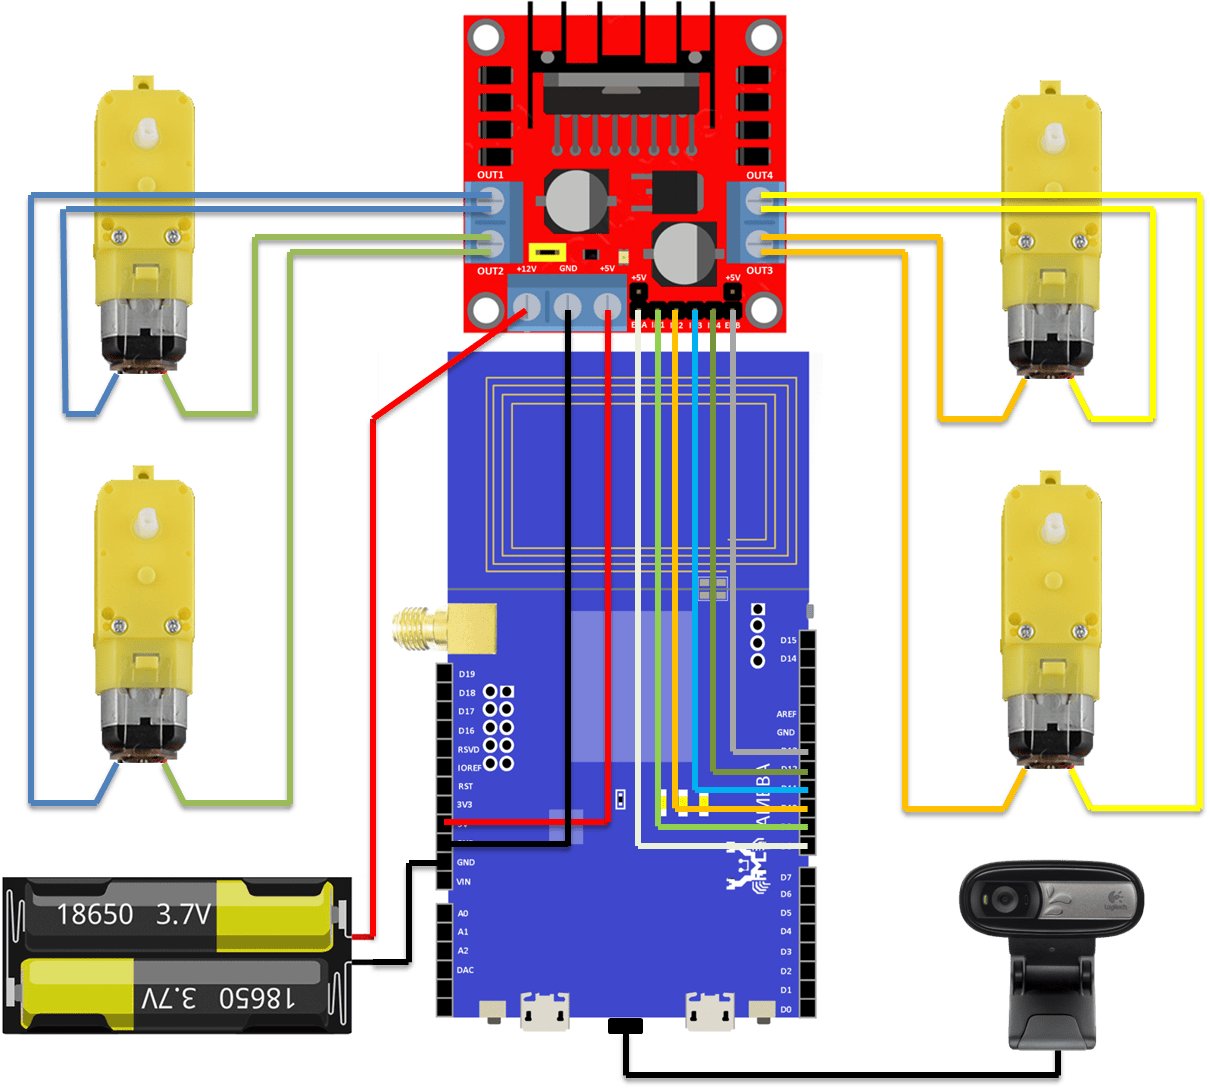 2005 pt cruiser fuse box diagram 4l80 wiring 2000 kia sephia 2006 chrysler